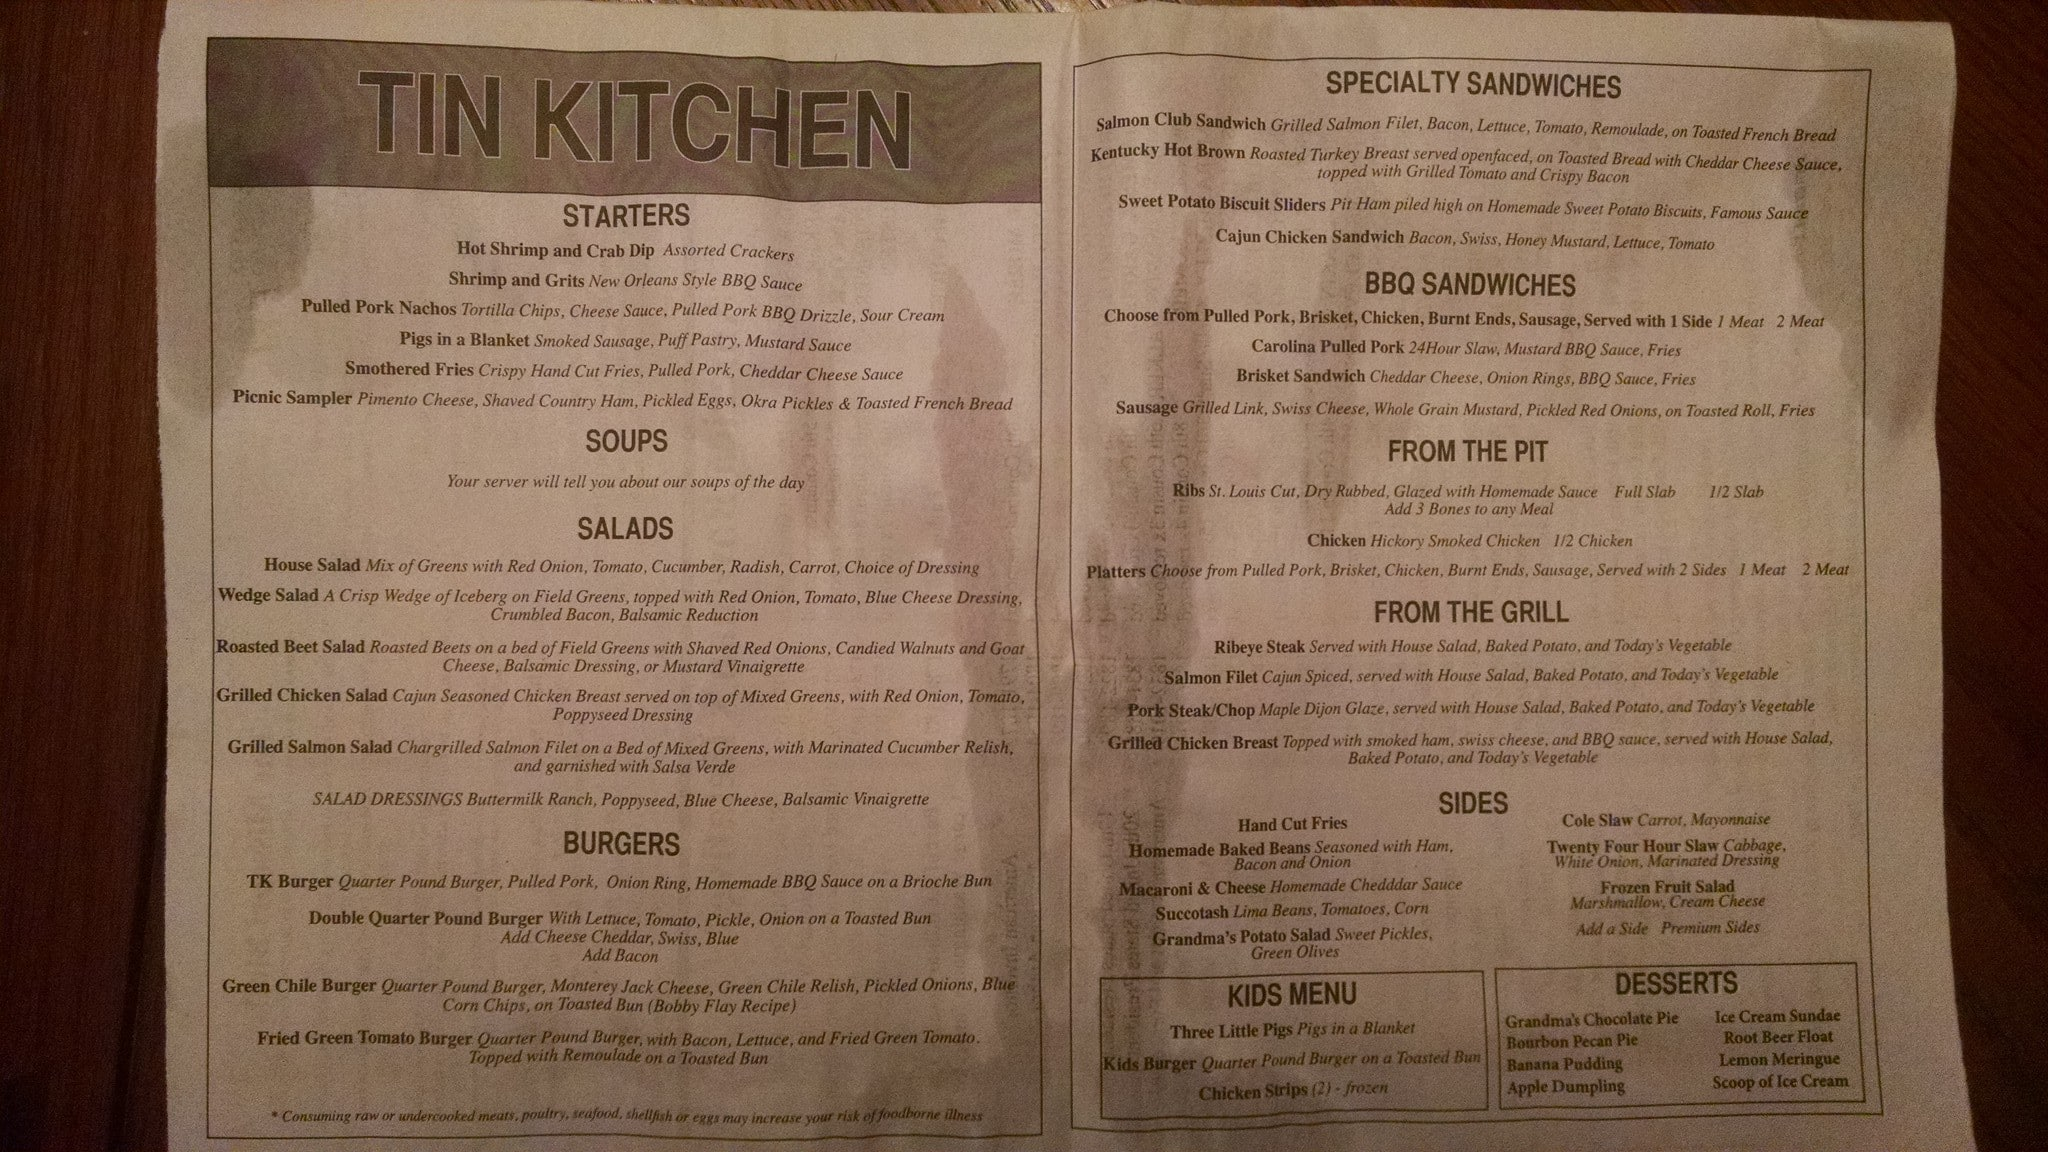 Tin Kitchen Weston Kansas City Missouri